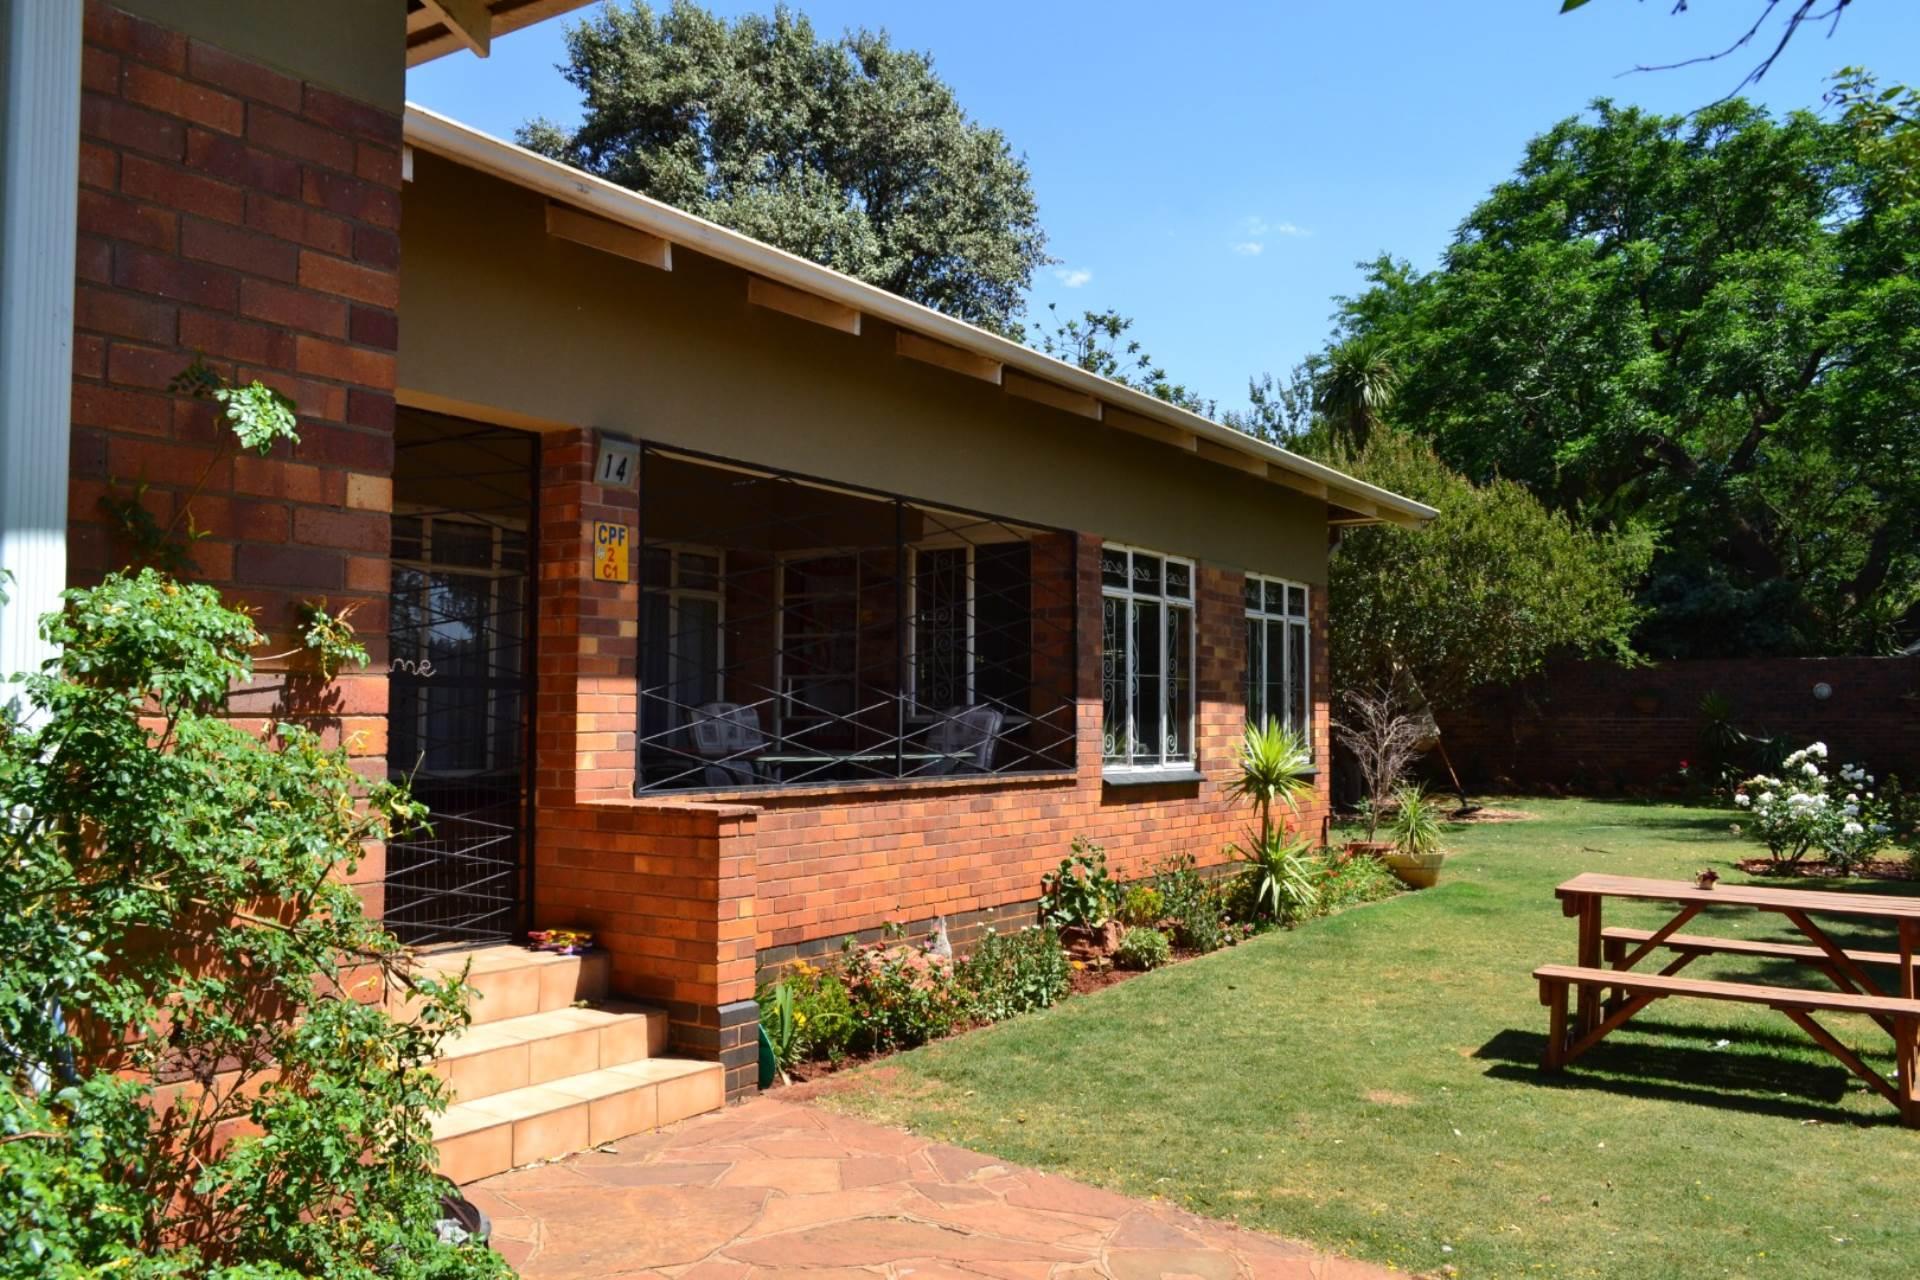 3 BedroomHouse For Sale In Strubenvale